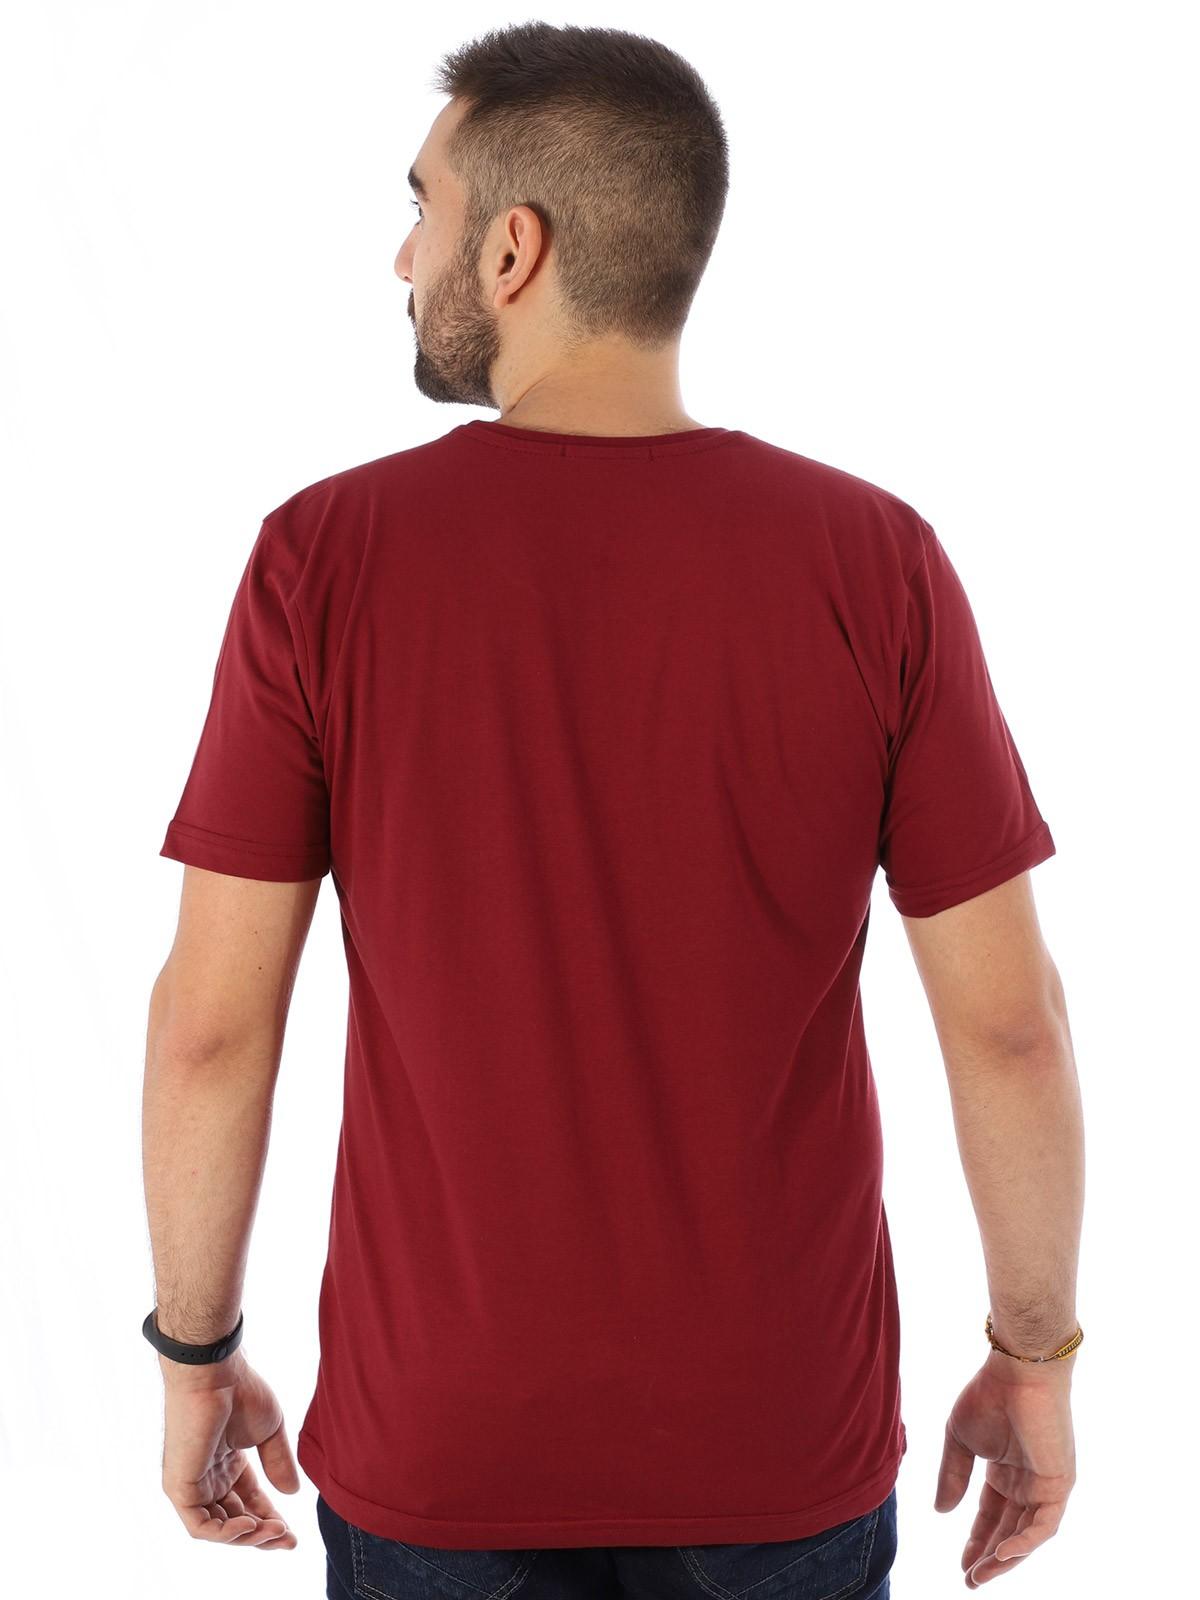 Camiseta Masculina Manga Curta Básica Abacaxi Bordo